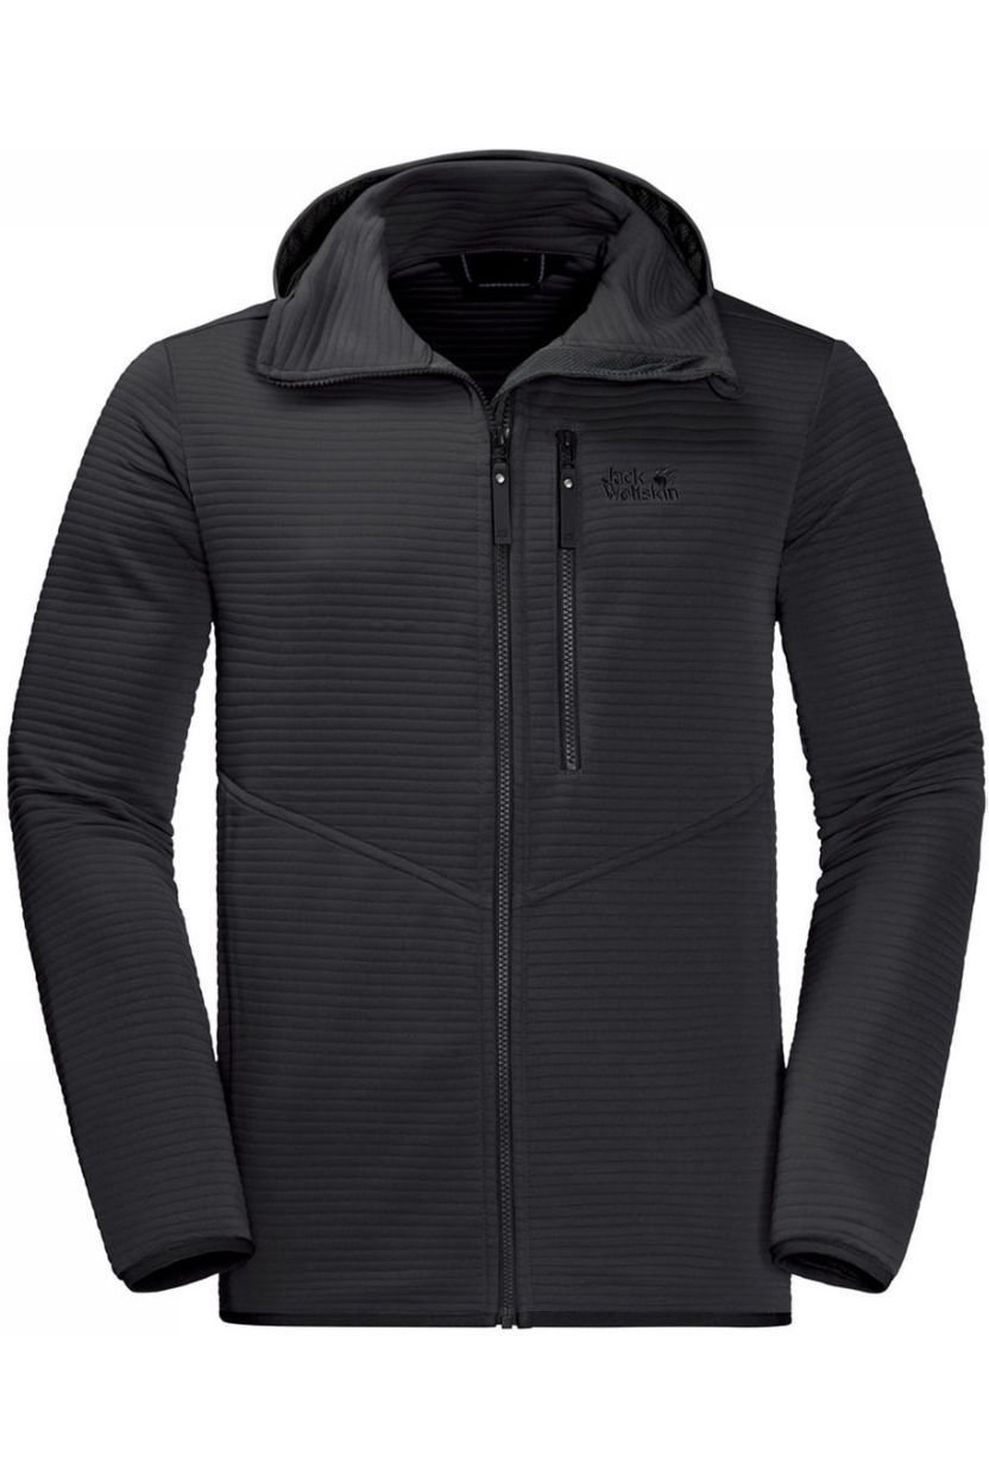 Jack Wolfskin Fleece Modesto Hooded voor heren Zwart Maten: M, L, XL, XXL